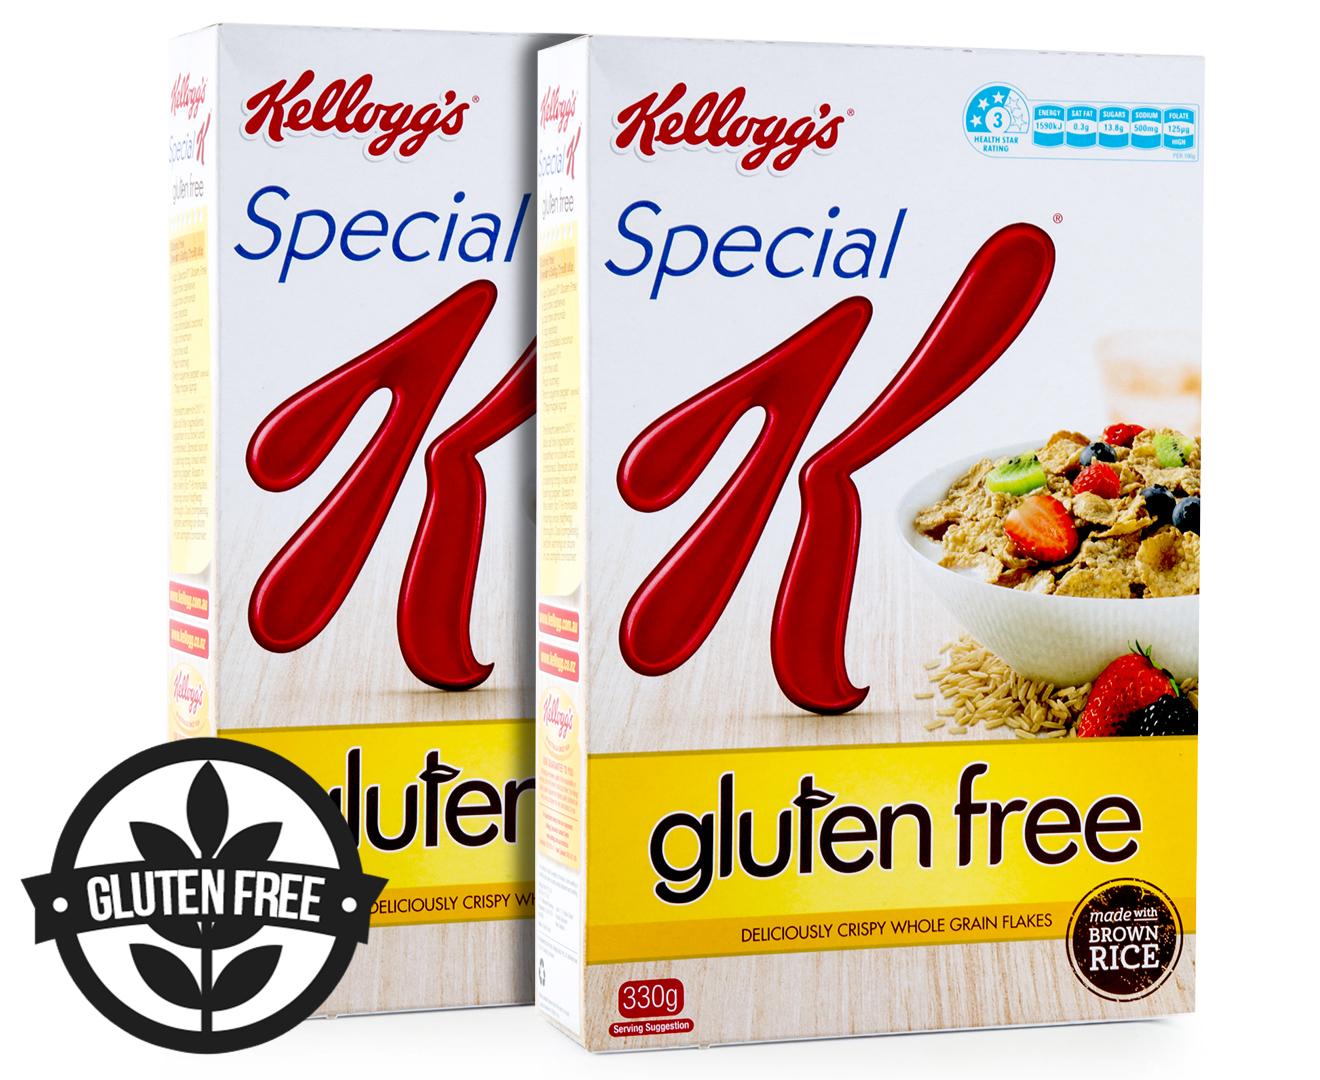 2 x Kellogg's Special K Gluten Free 330g | GroceryRun.com.au